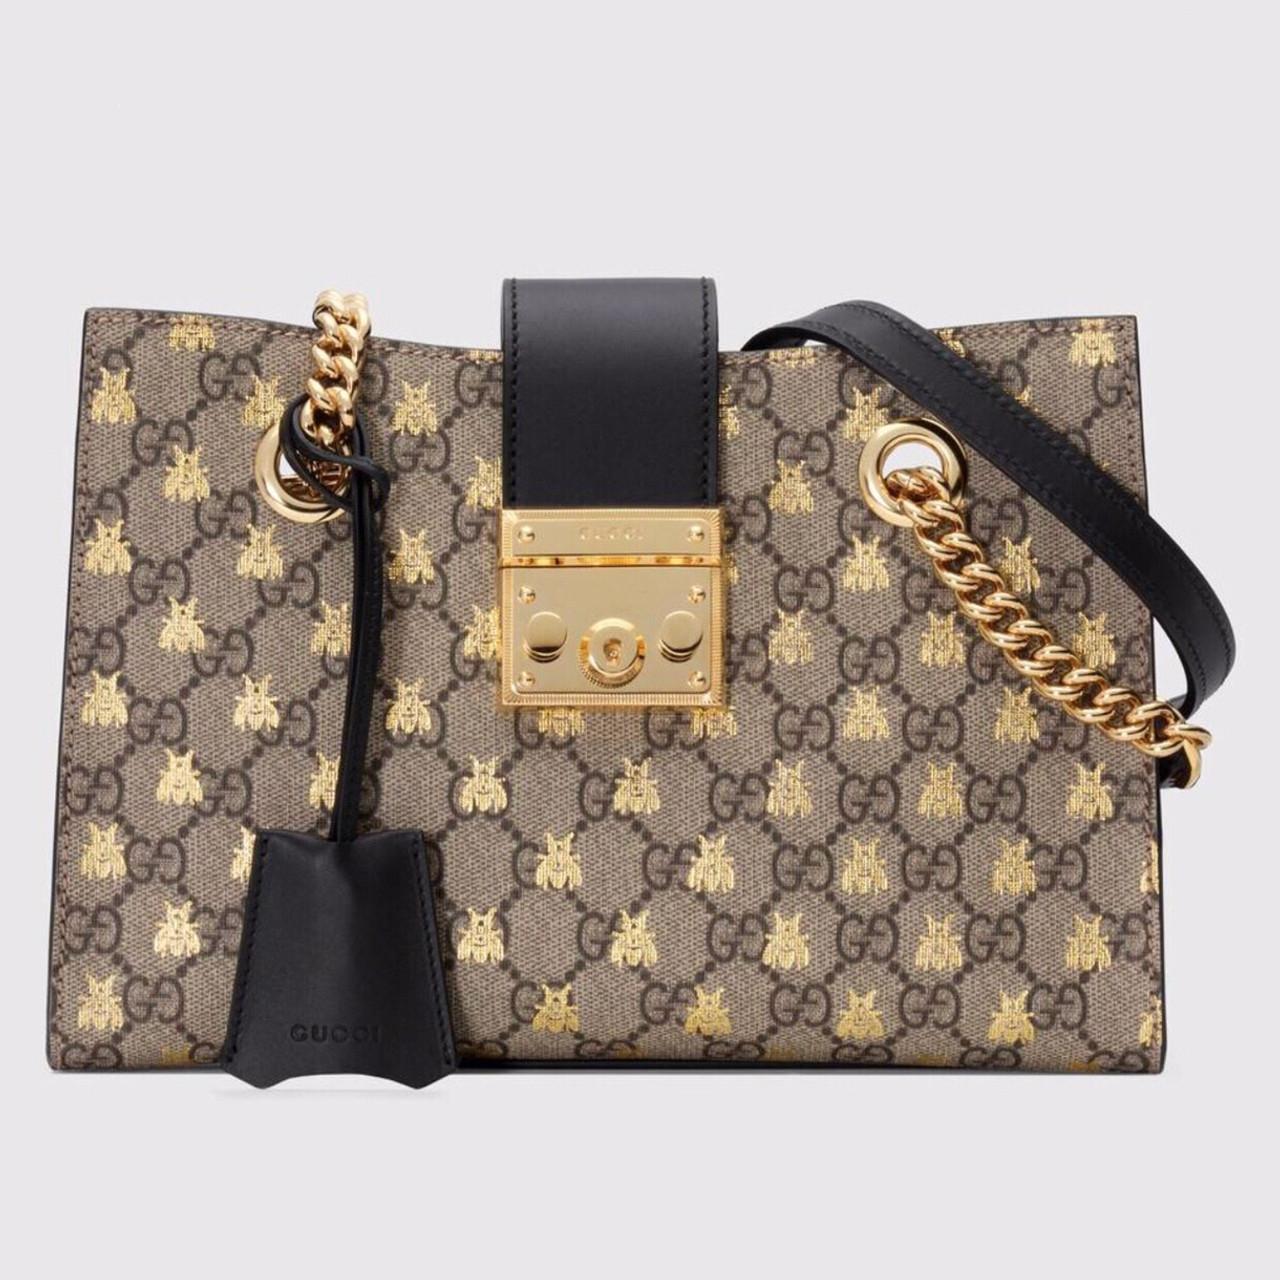 fc423b699 Gucci Padlock small GG bees shoulder bag - Bella Vita Moda